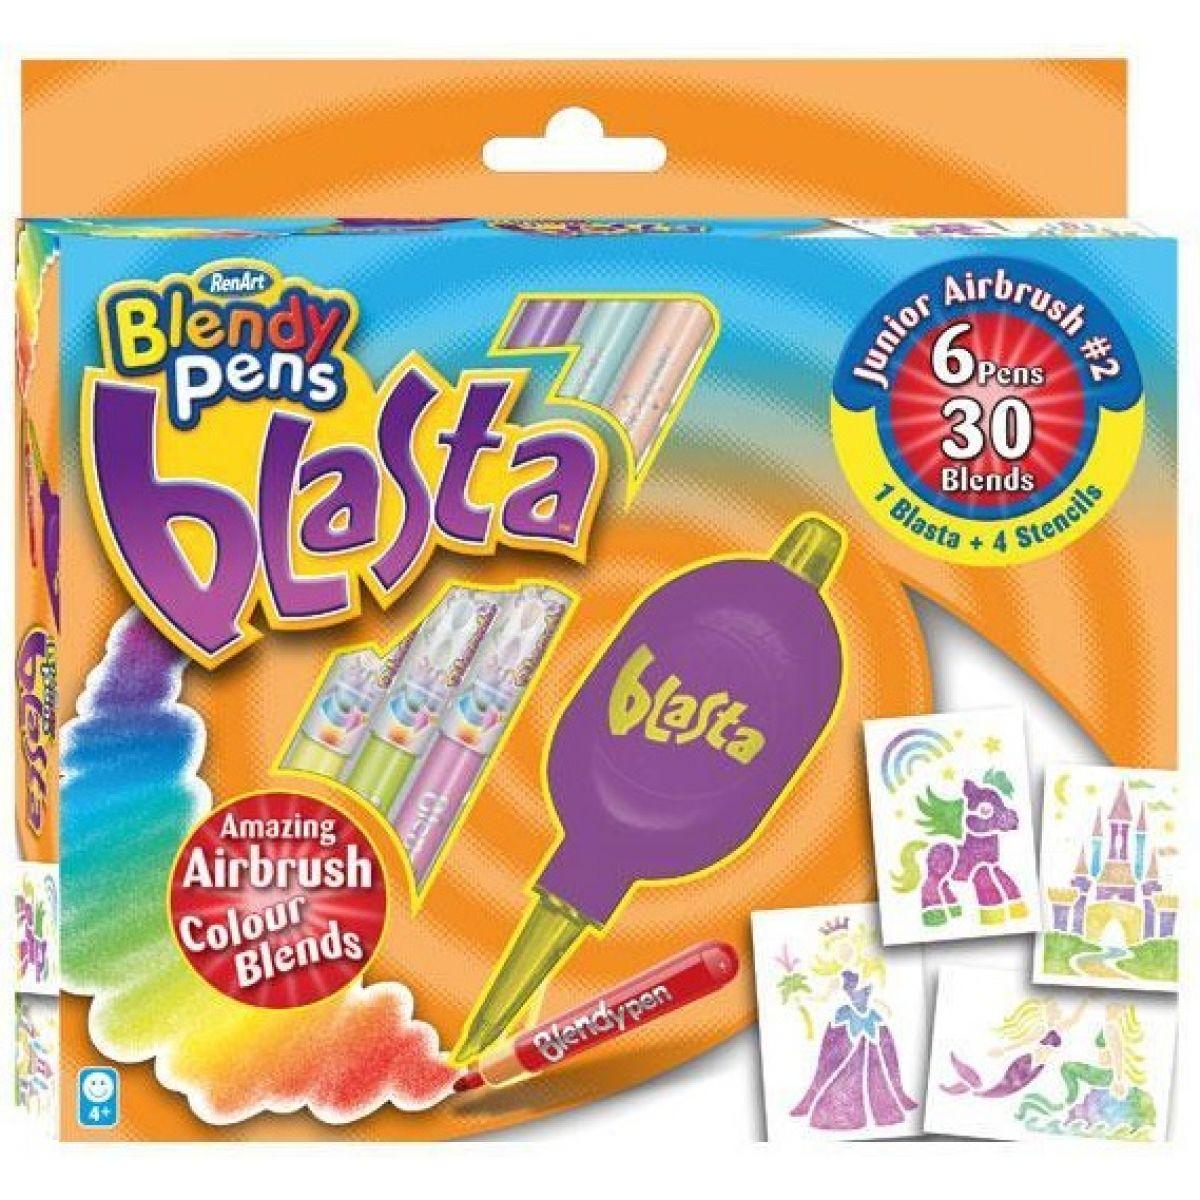 Blendy pens Blasta Junior Airbrush 2